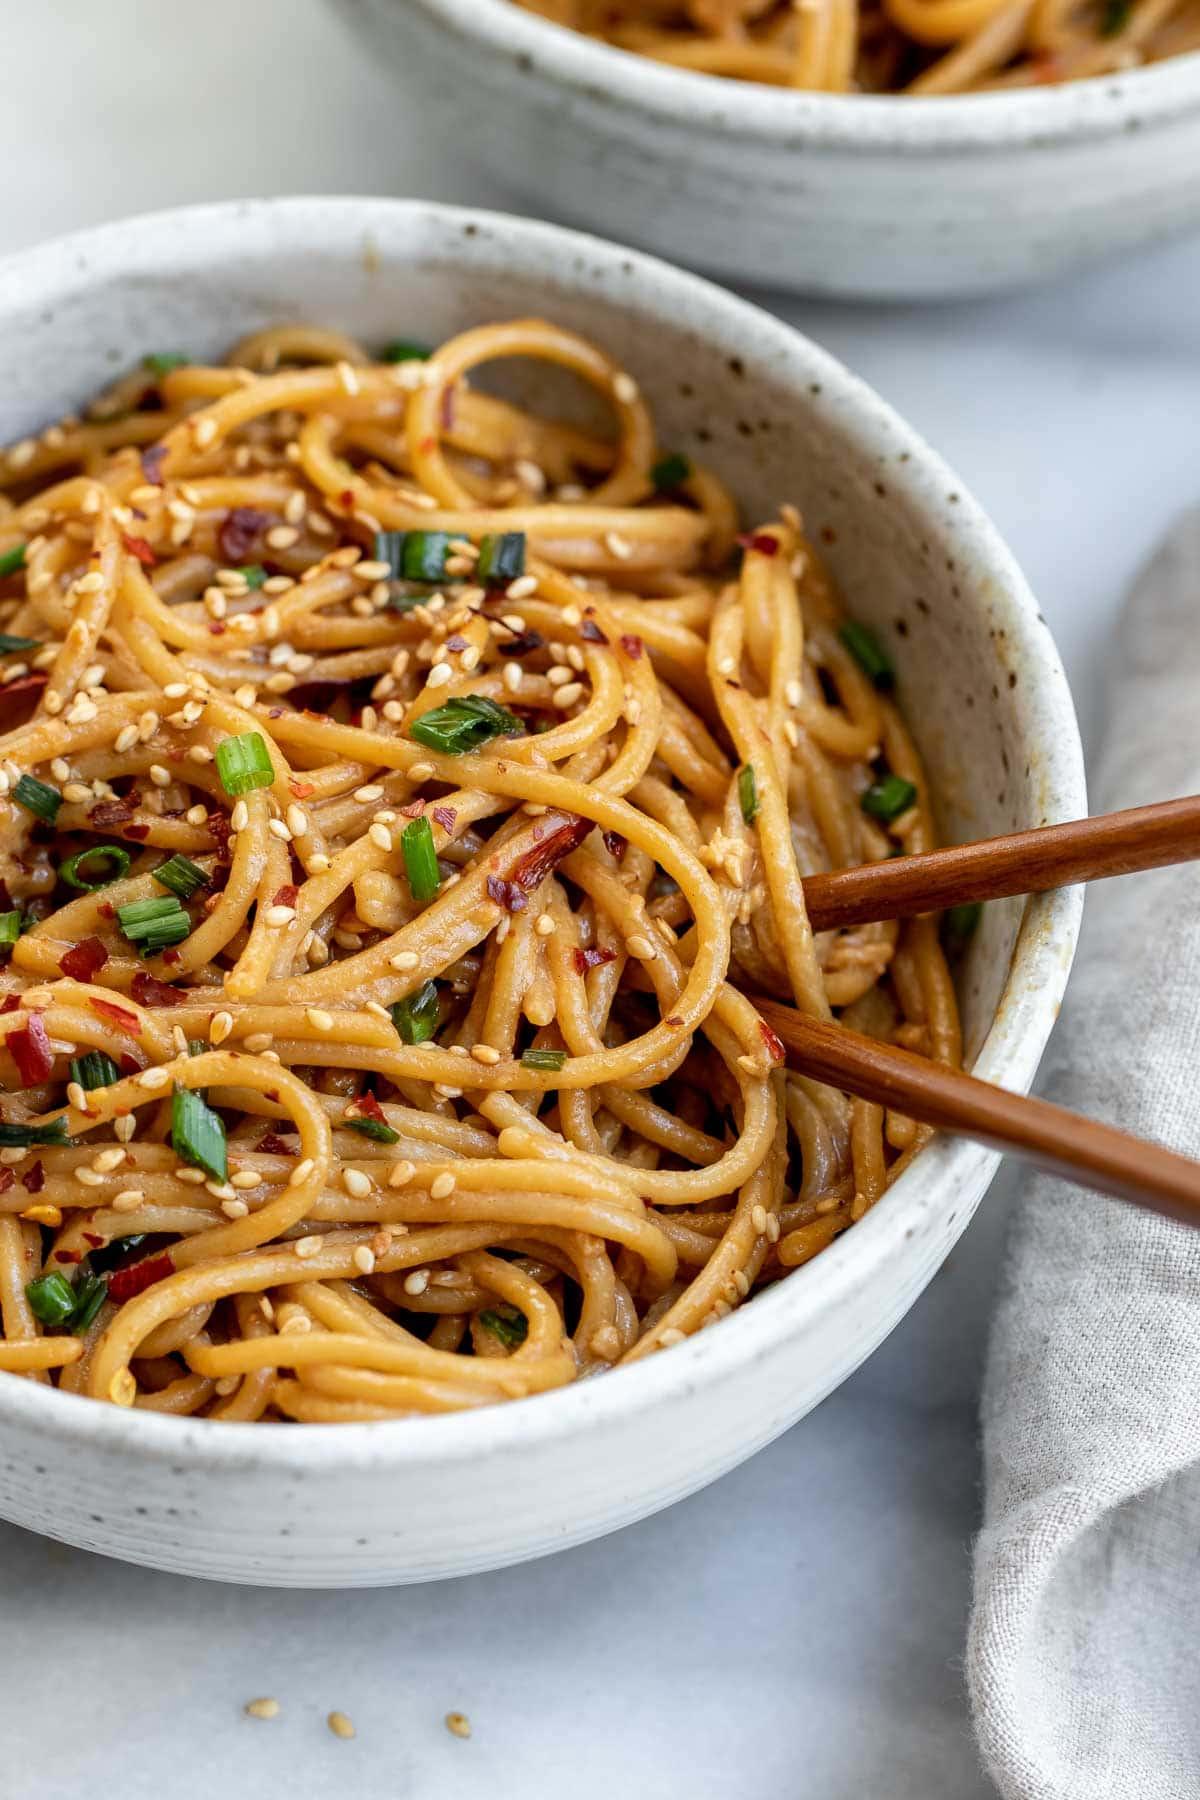 Up close image of garlic sesame noodles with chopsticks on the side.